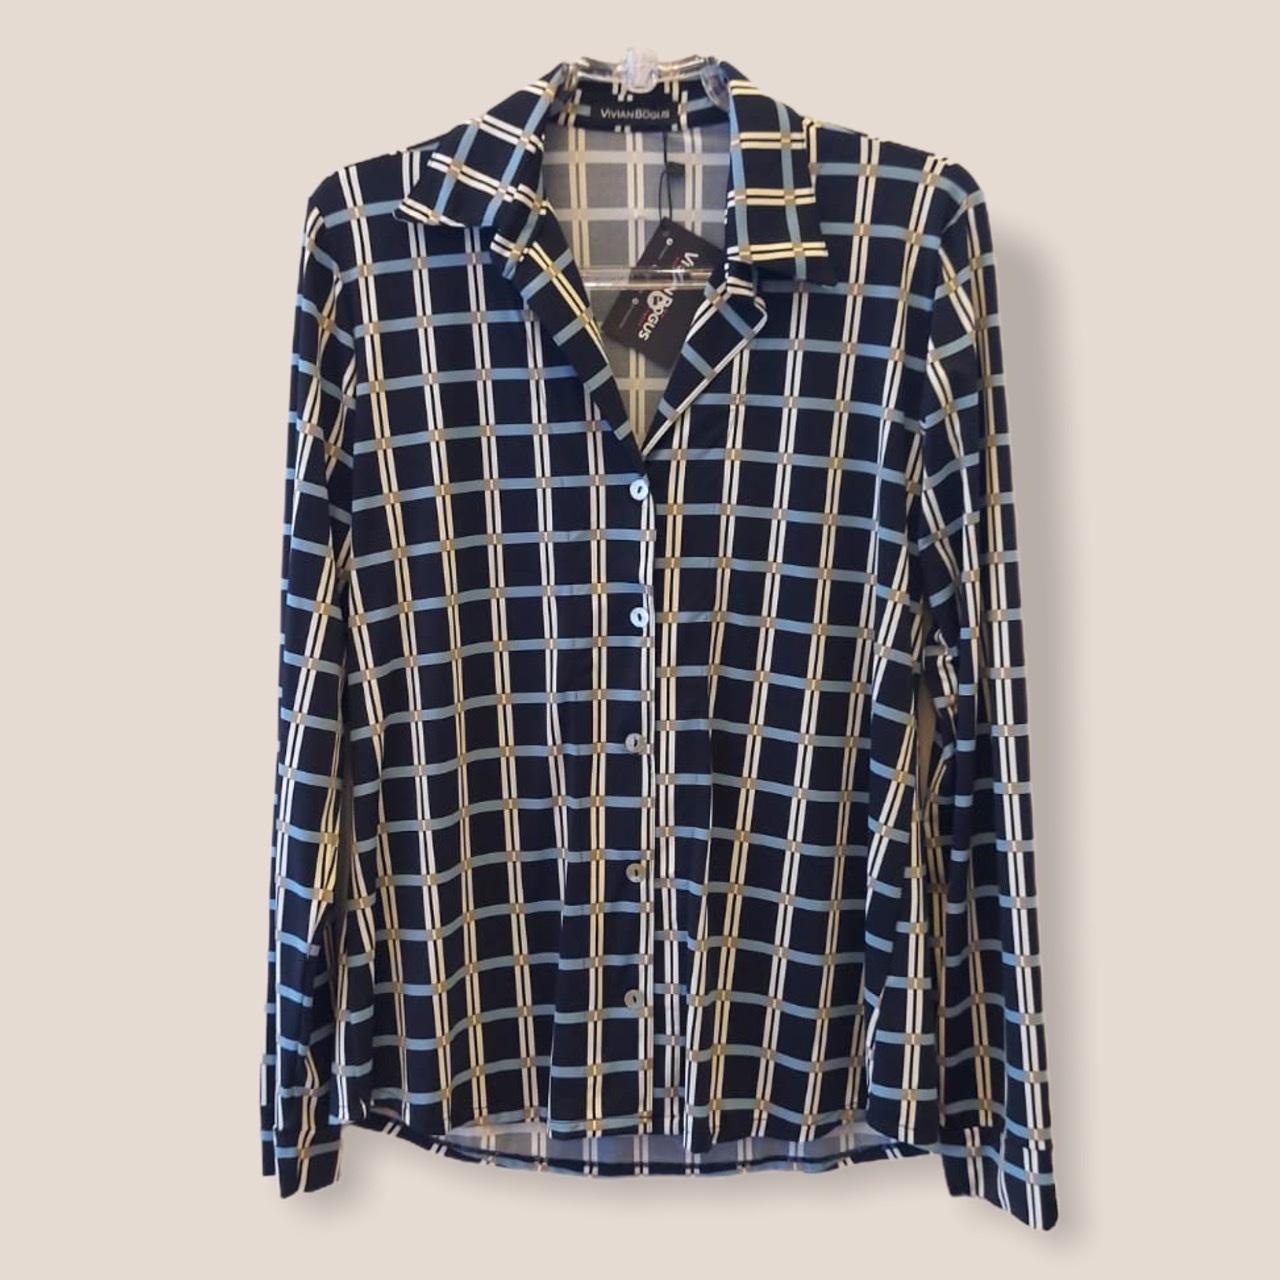 Camisa em malha fria estampada xadrez  - Vivian Bógus